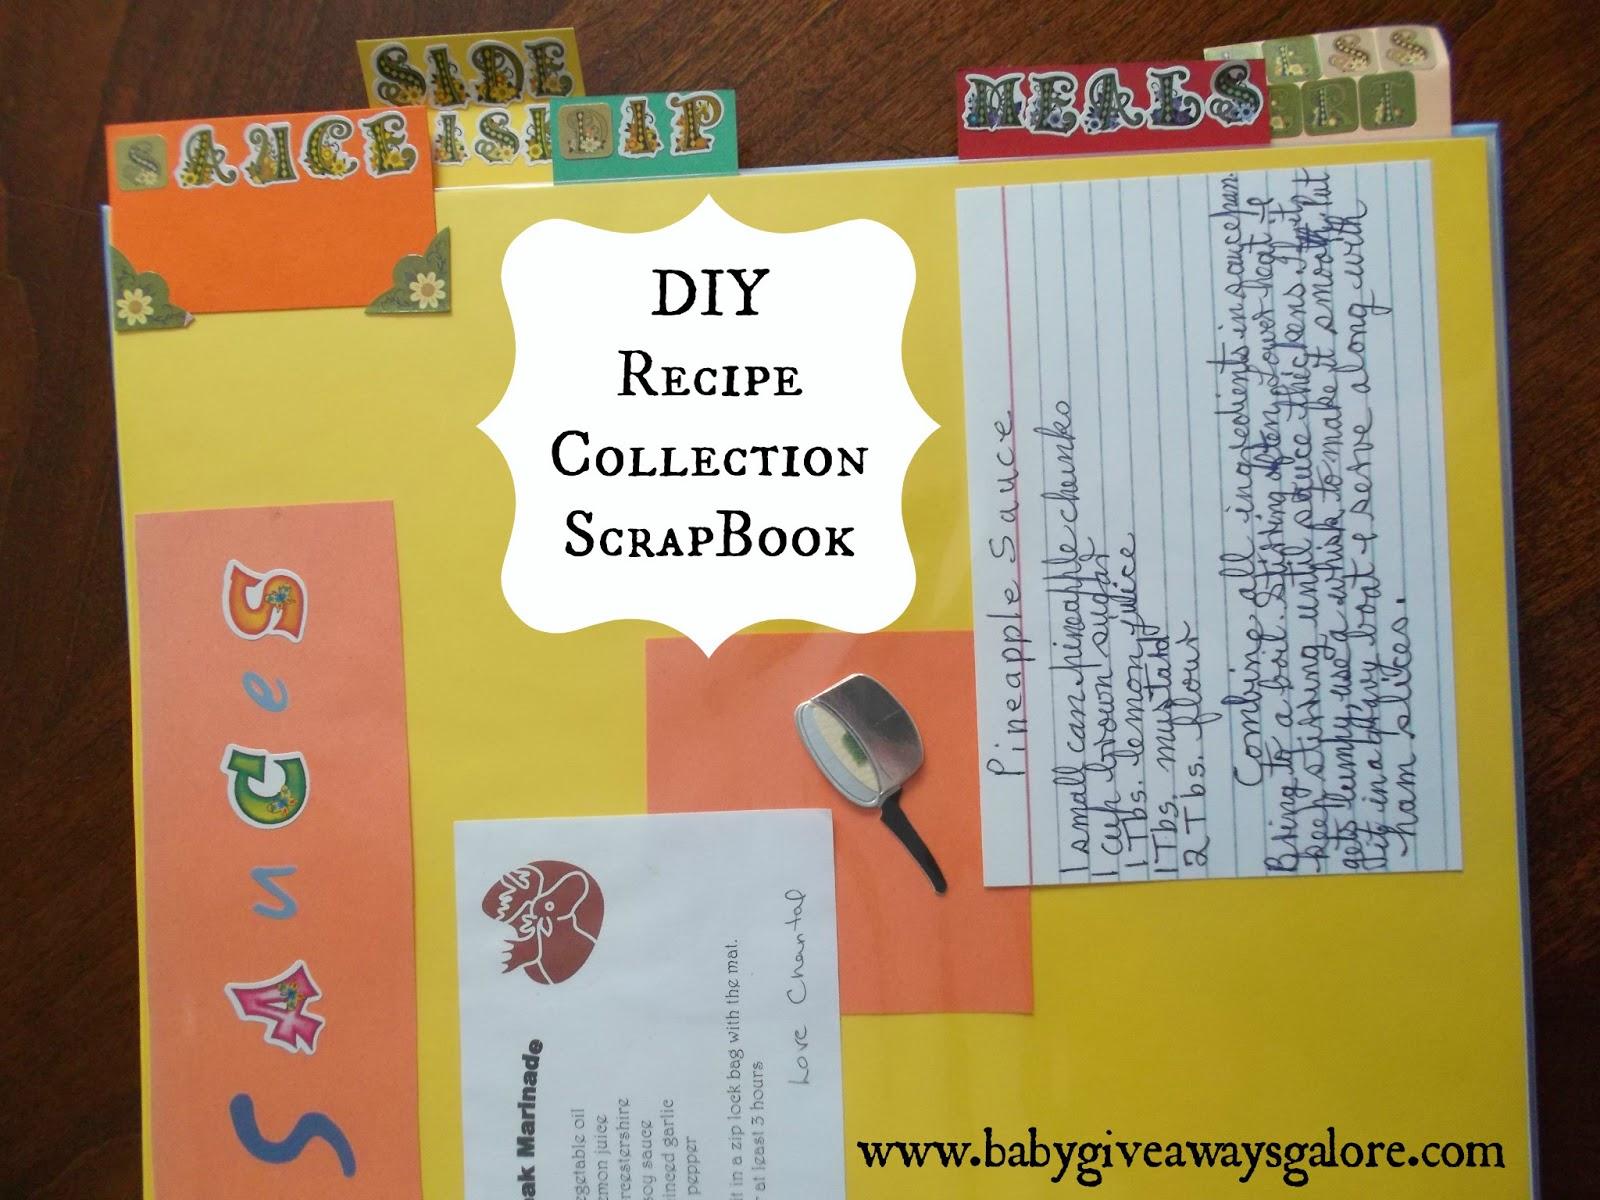 How to scrapbook a recipe book - Diy Recipe Collection Scrapbook